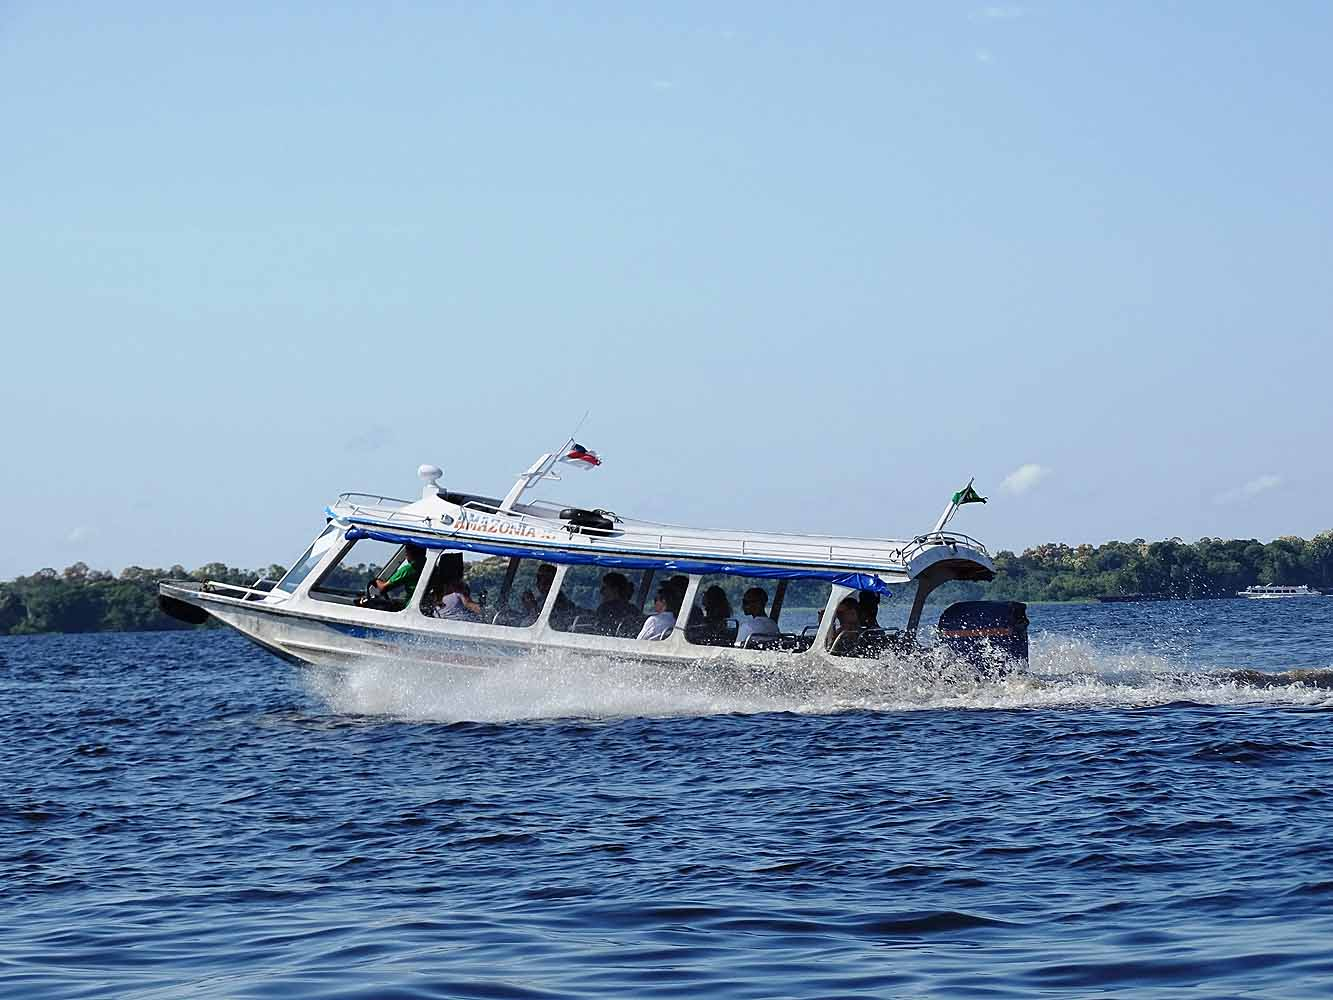 Brasilien Amazonas - mit dem Boot